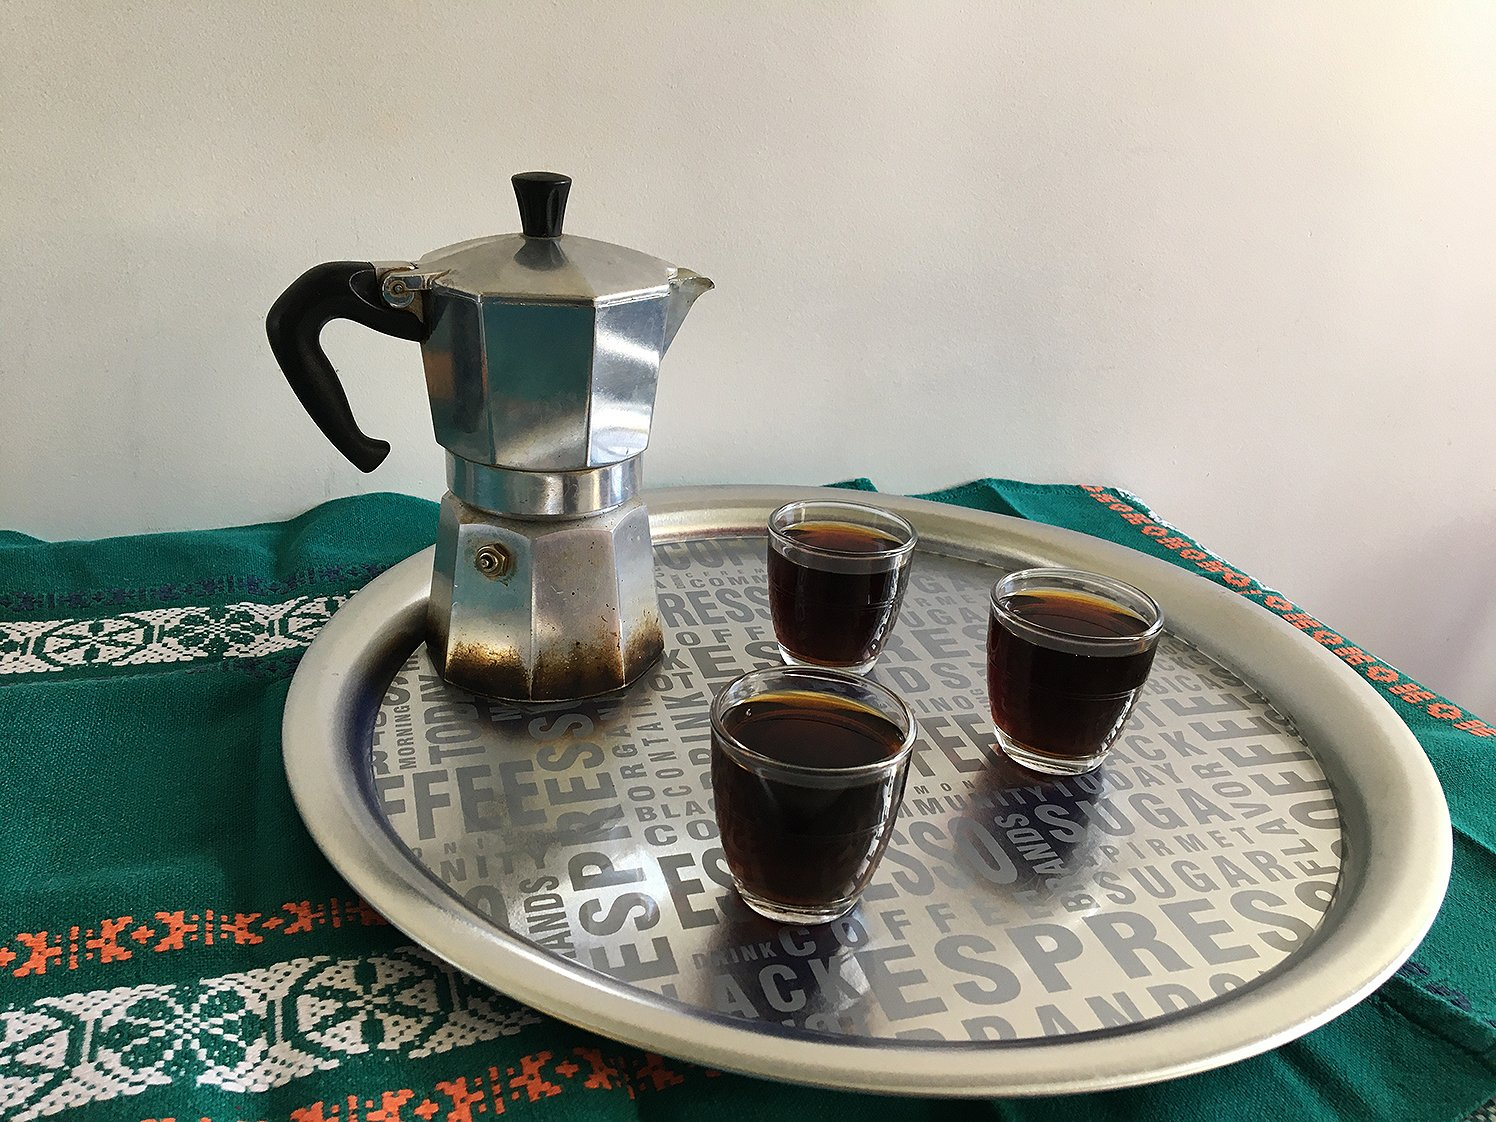 caffe_orzo_60bce9fd55088.jpeg